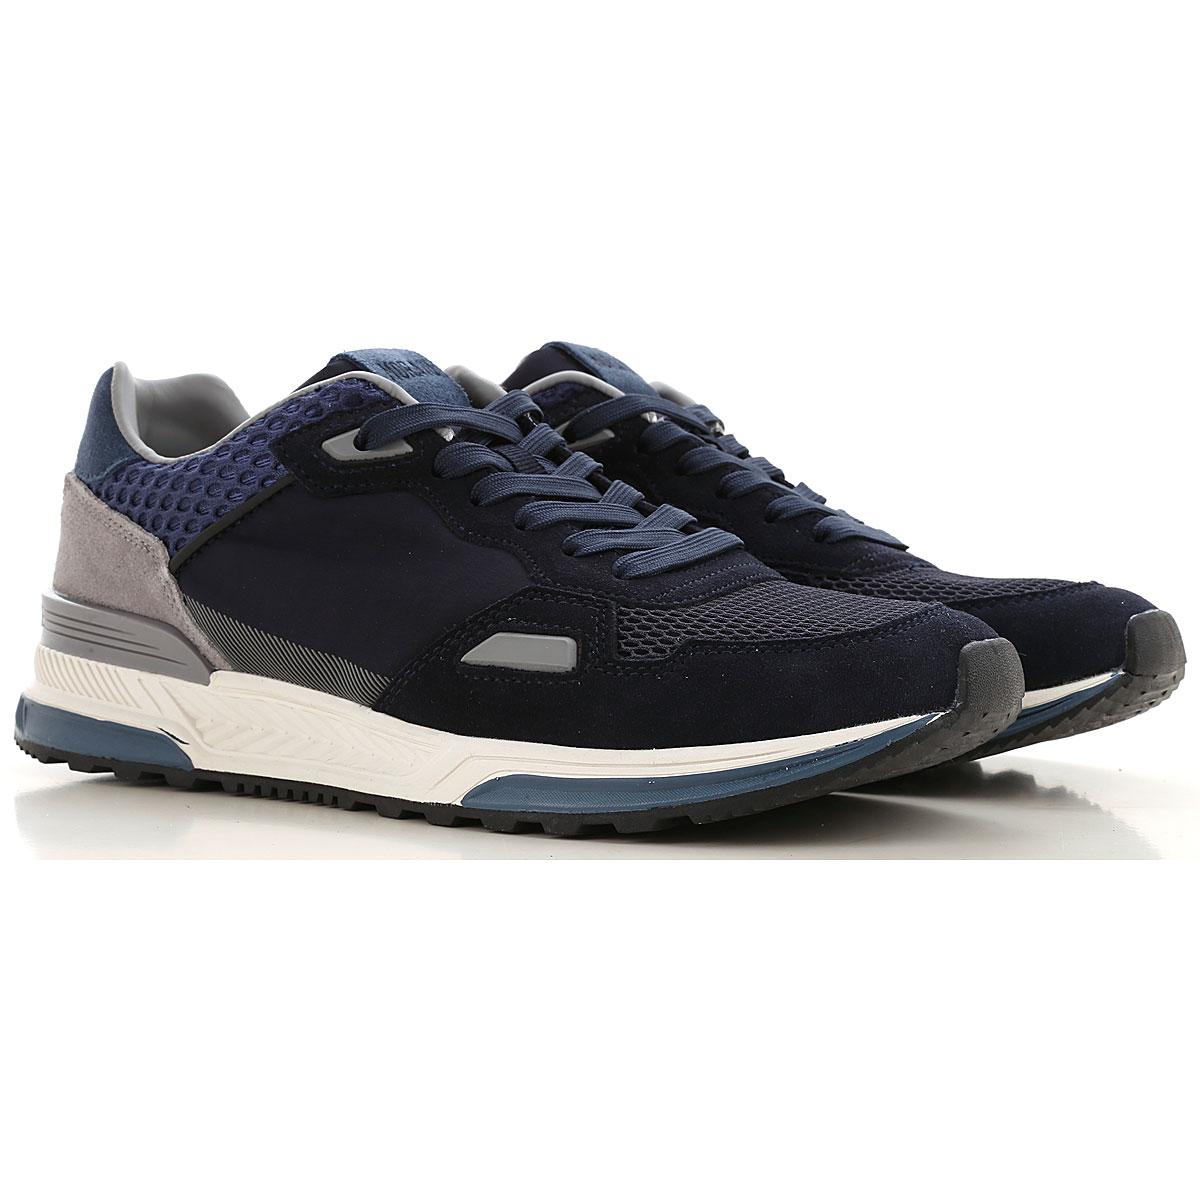 Antony Morato Sneakers for Men On Sale, Blue, suede, 2019, 10.5 7.5 8